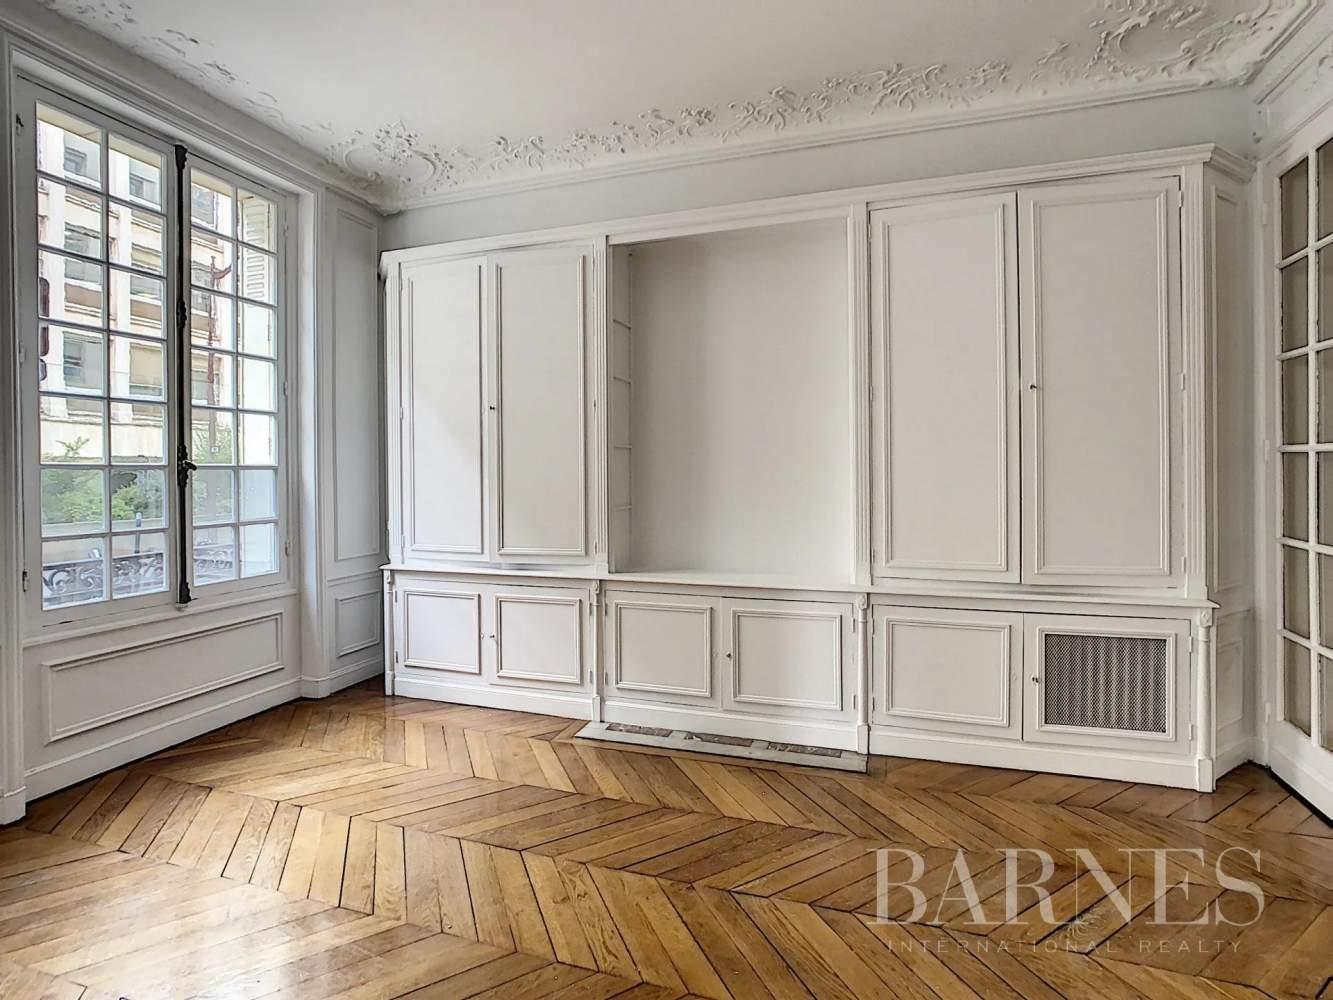 Neuilly-sur-Seine  - Appartement 6 Pièces 3 Chambres - picture 2